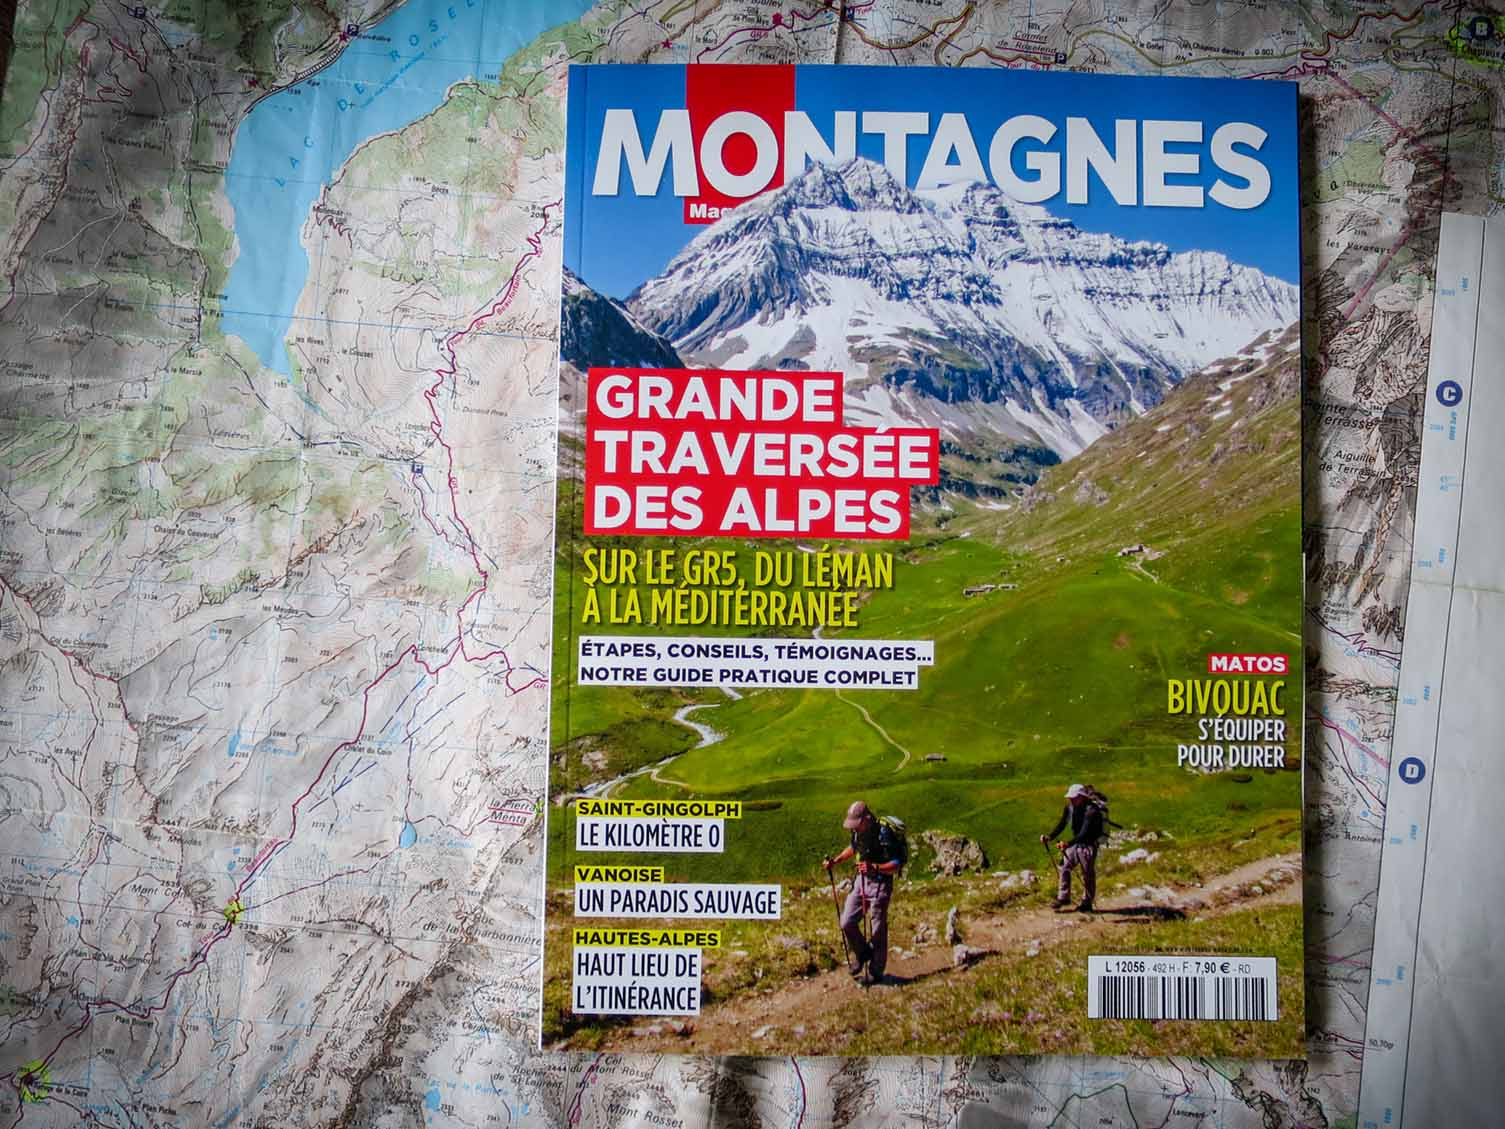 Montagnes Magazine Slow Rando GR5 Traversee Alpes